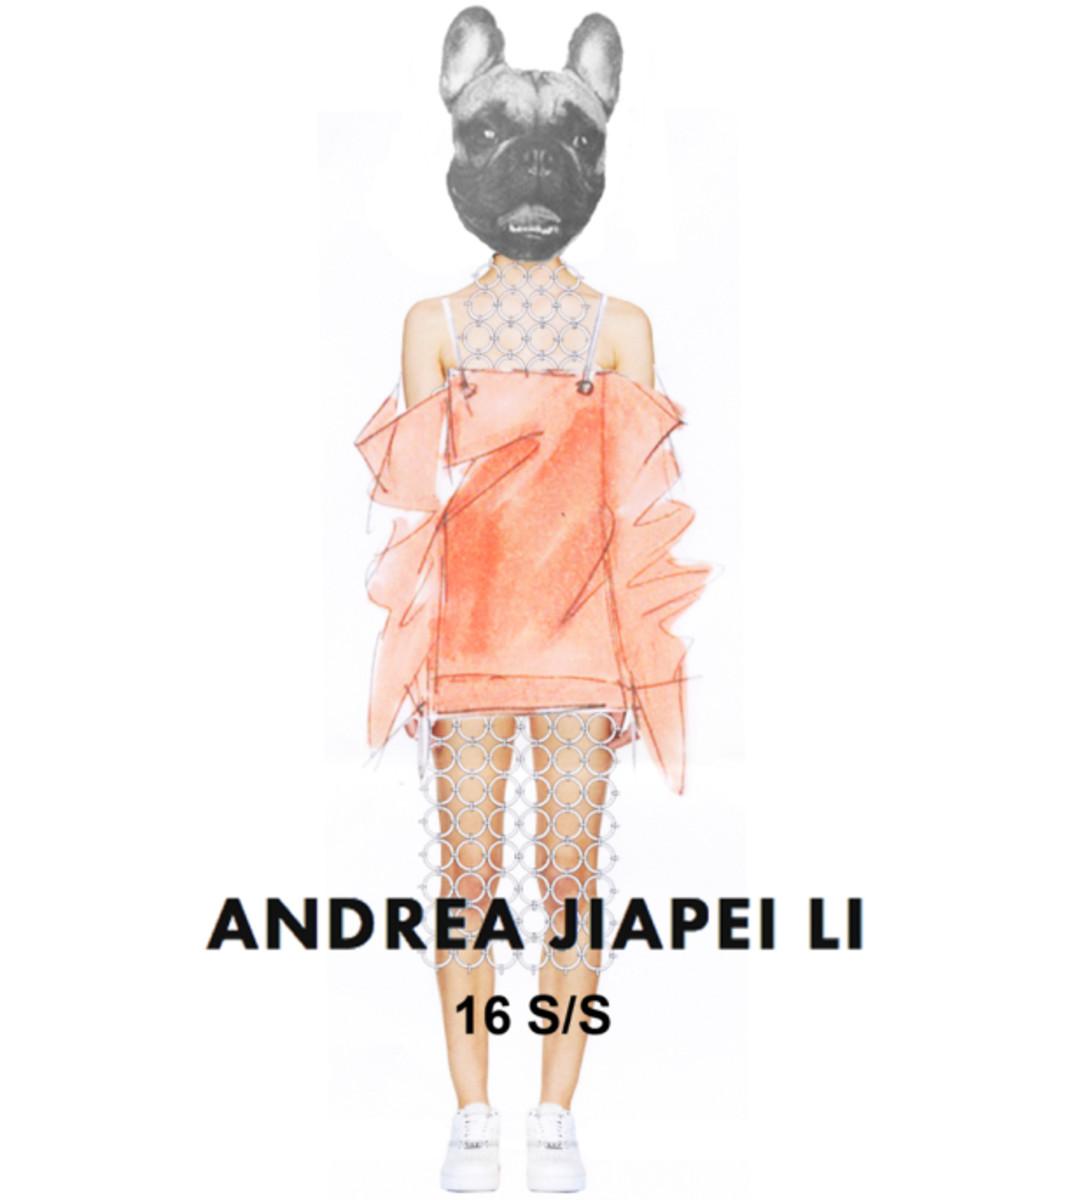 A sneak peek at Andrea Jiapei Li's spring 2016 collection. Photo: Andrea Jiapei Li